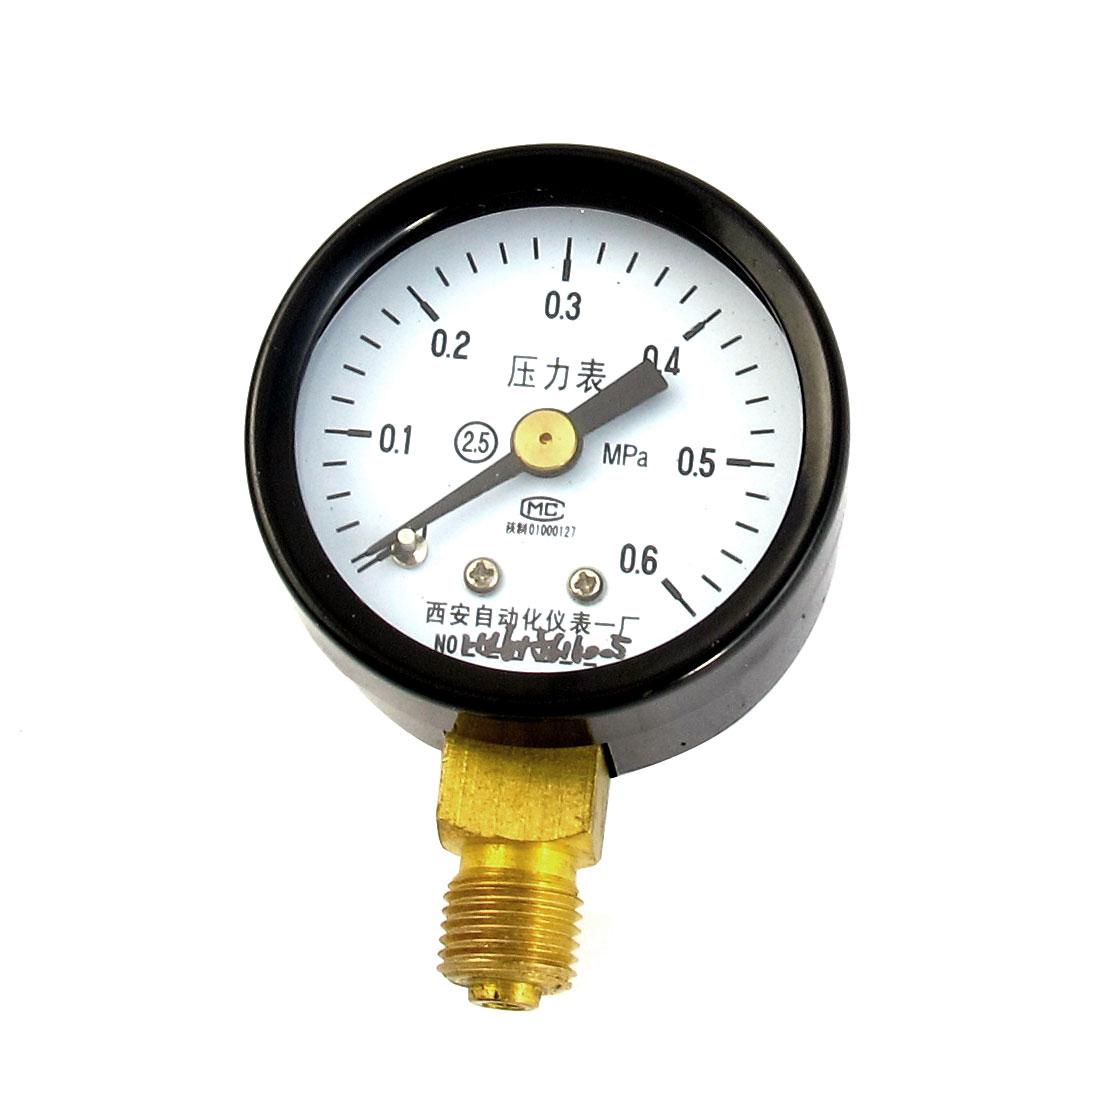 Black Metal Case 1/8PT Male Threaded 0-0.6Mpa Pneumatic Air Pressure Gauge